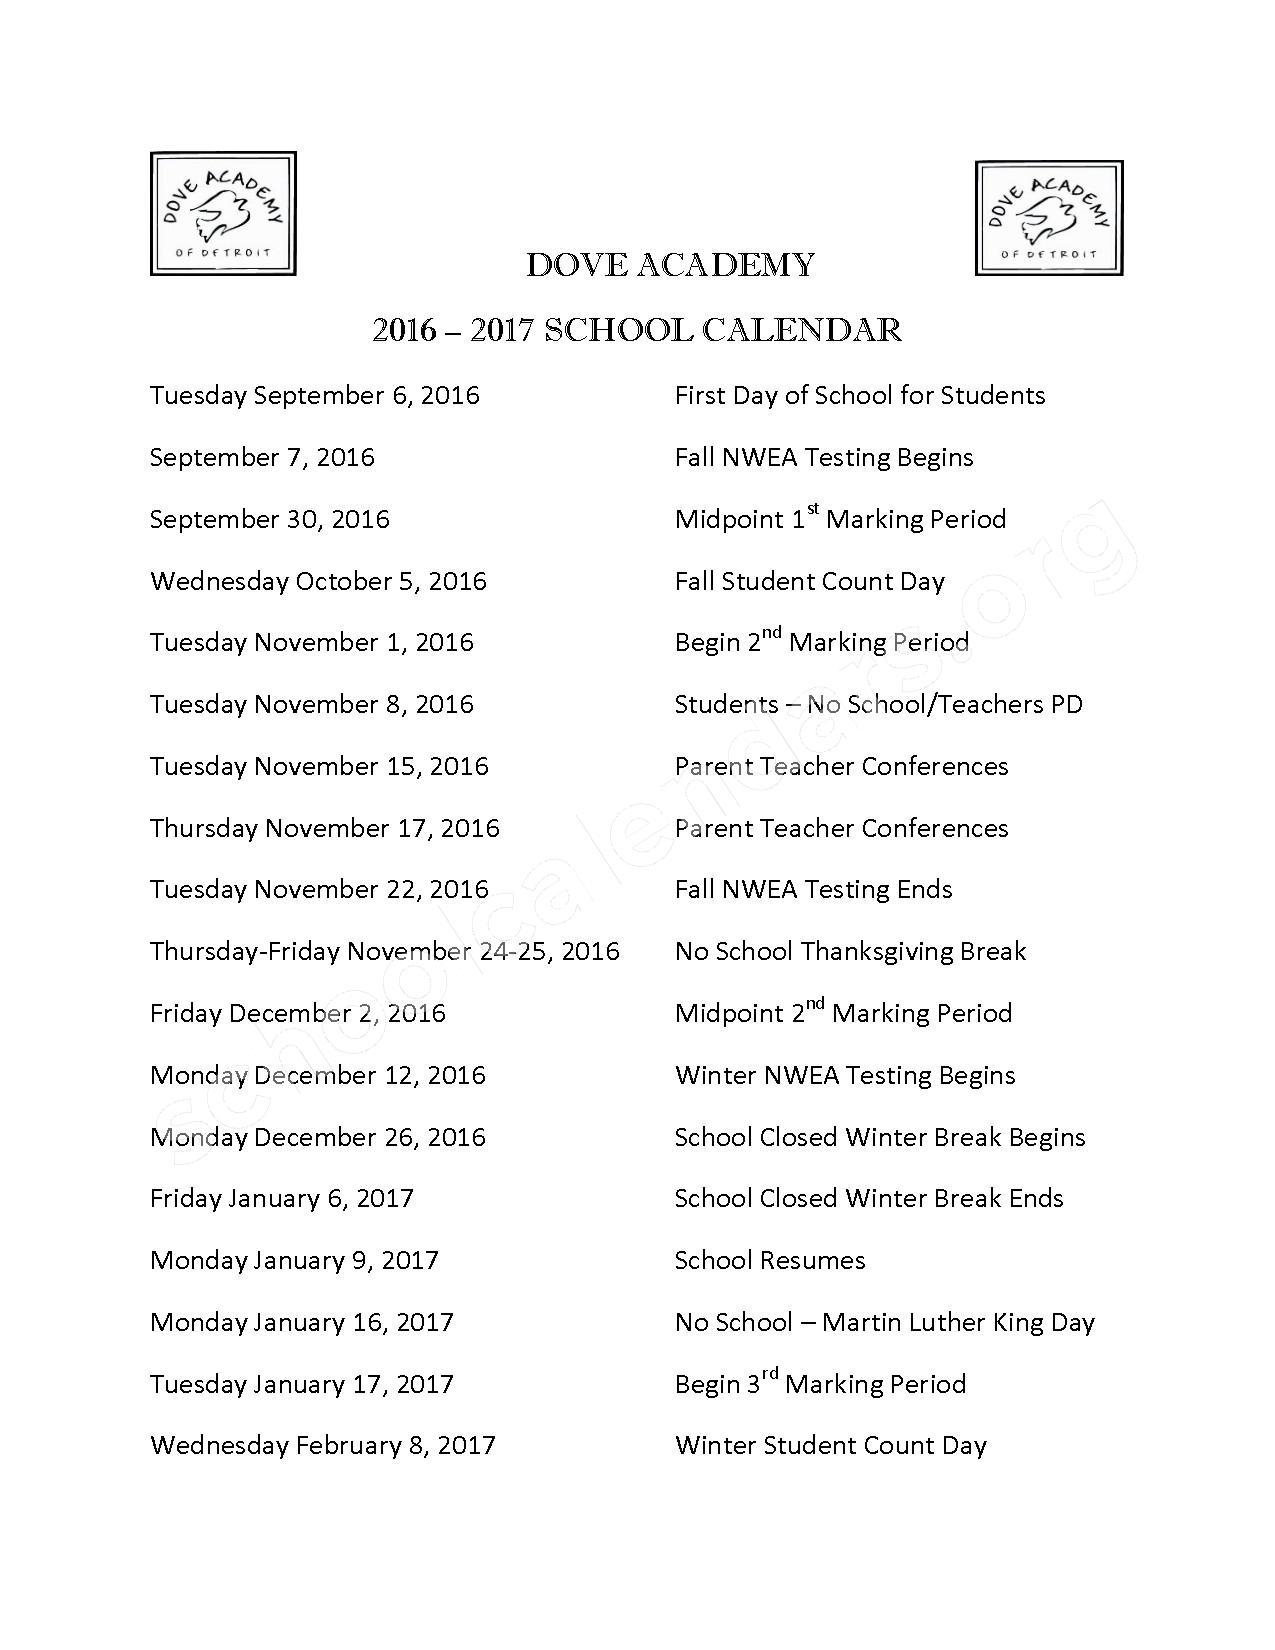 2016 - 2017 School Calendar – Dove Academy of Detroit – page 1